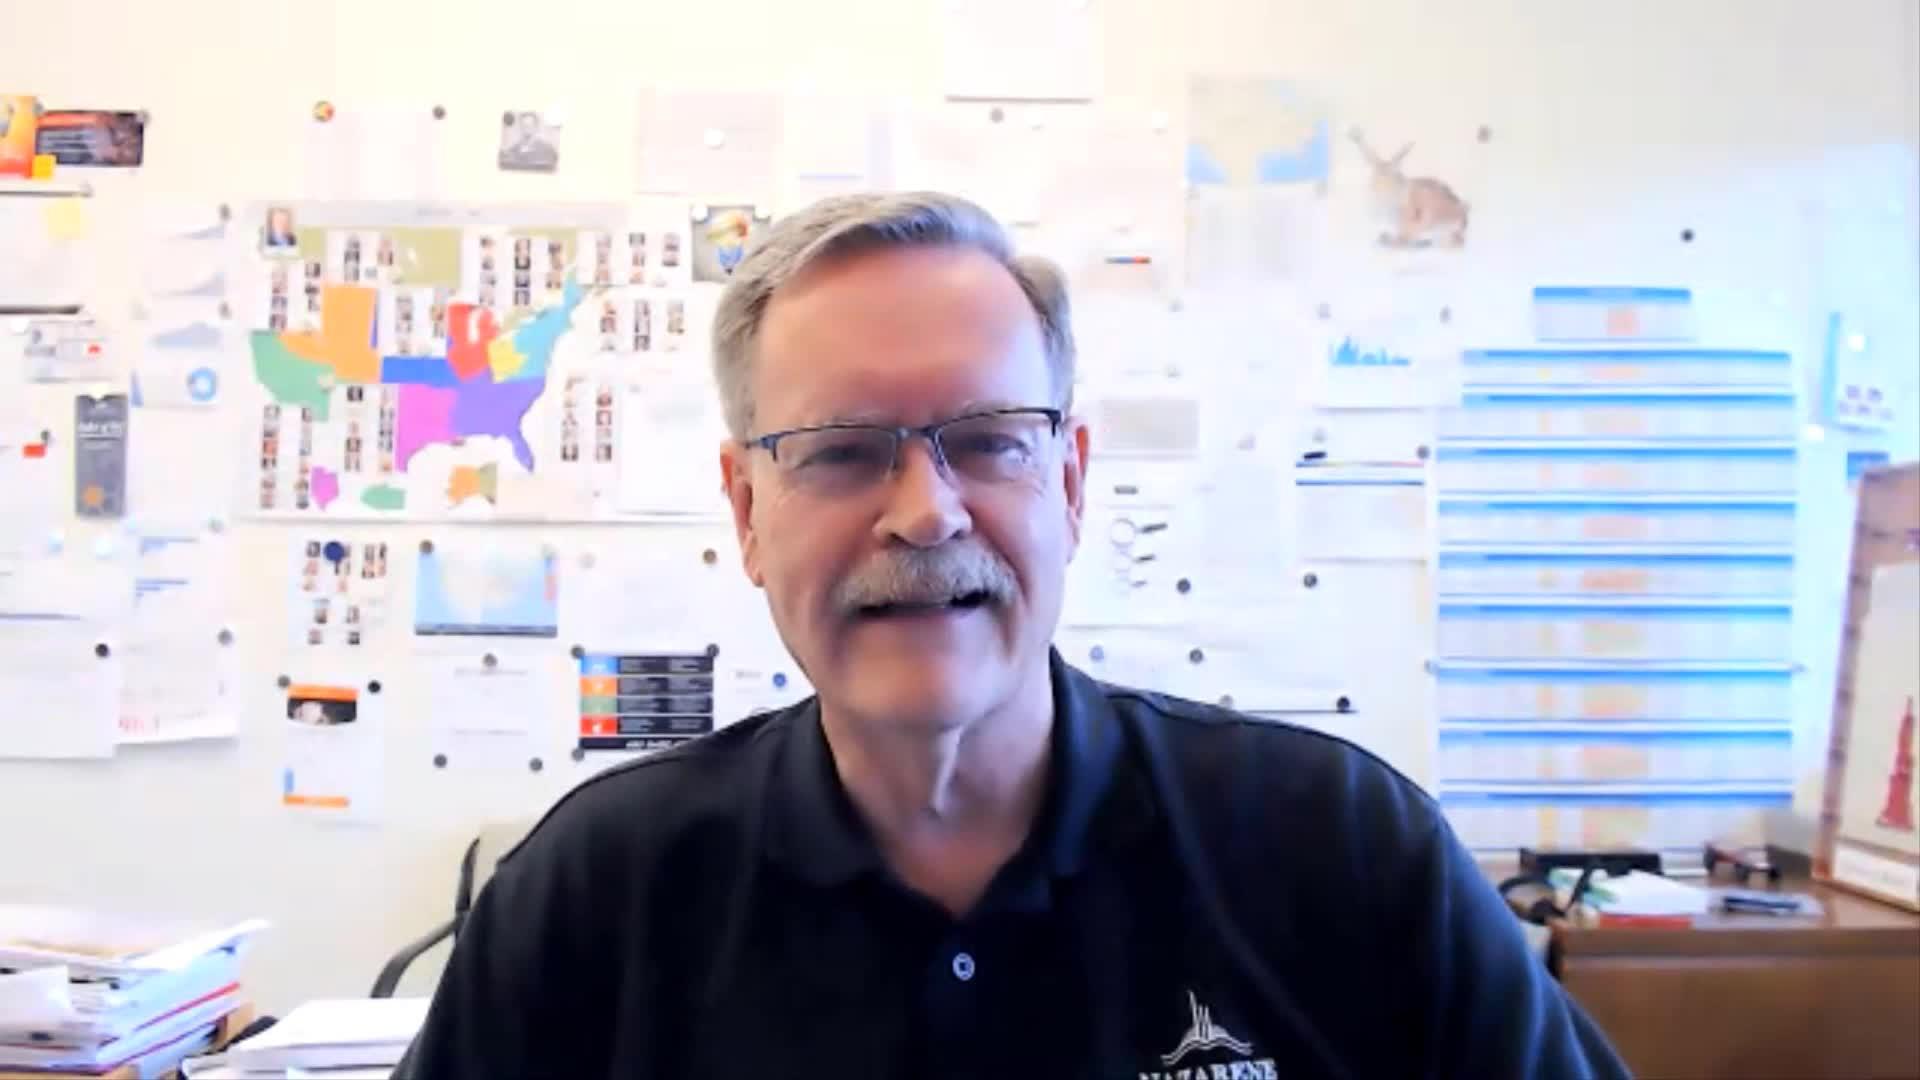 Dr. David M. Church